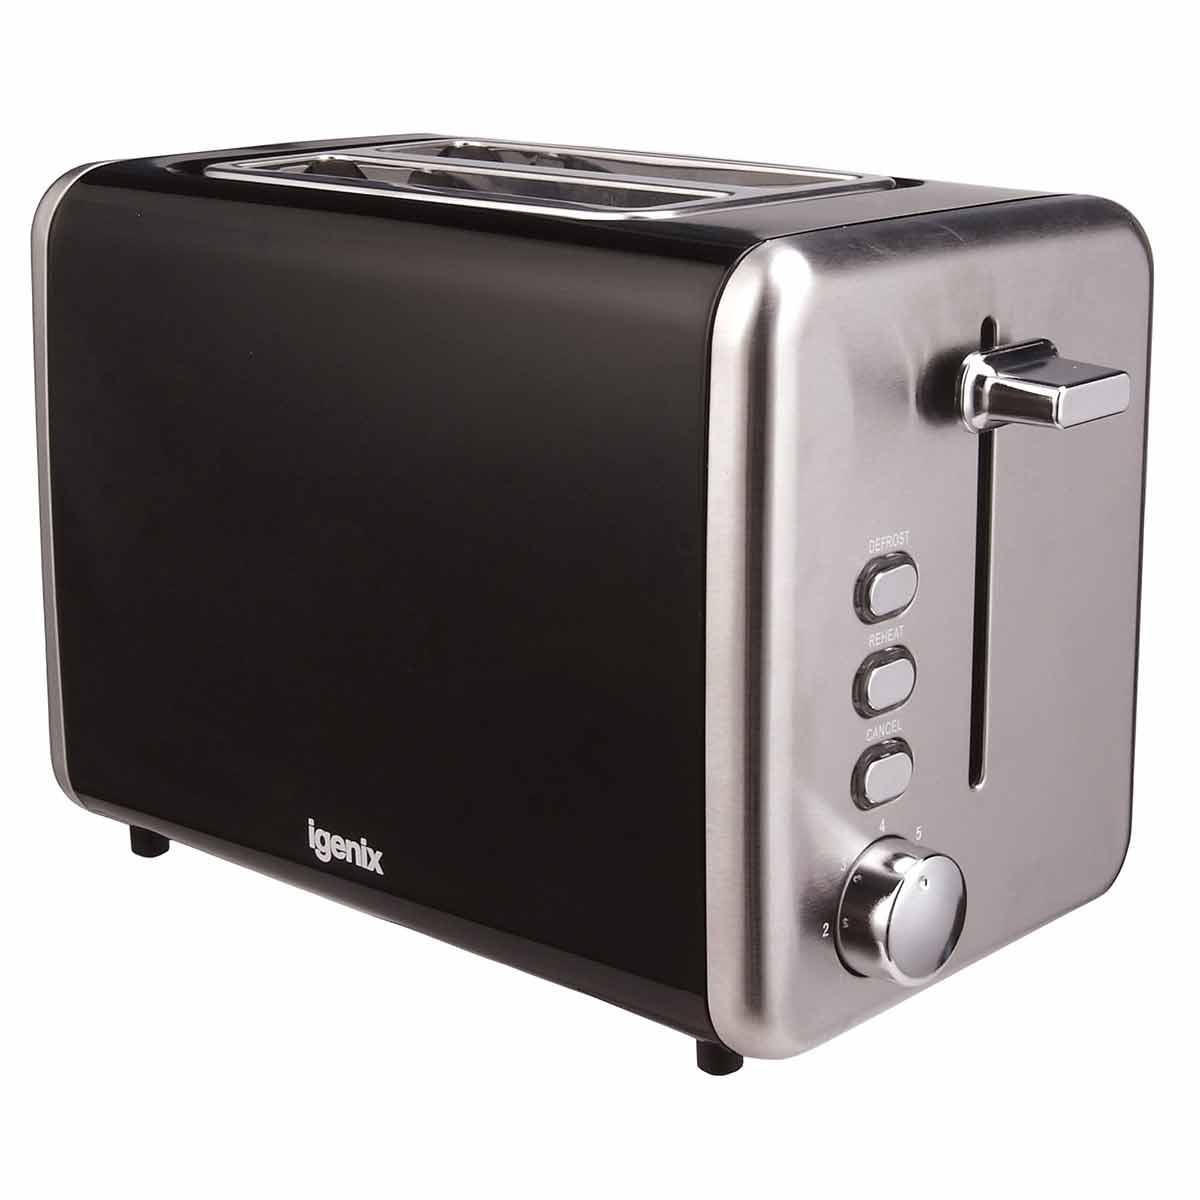 Igenix 2 Slice Toaster with Stainless Steel, Black